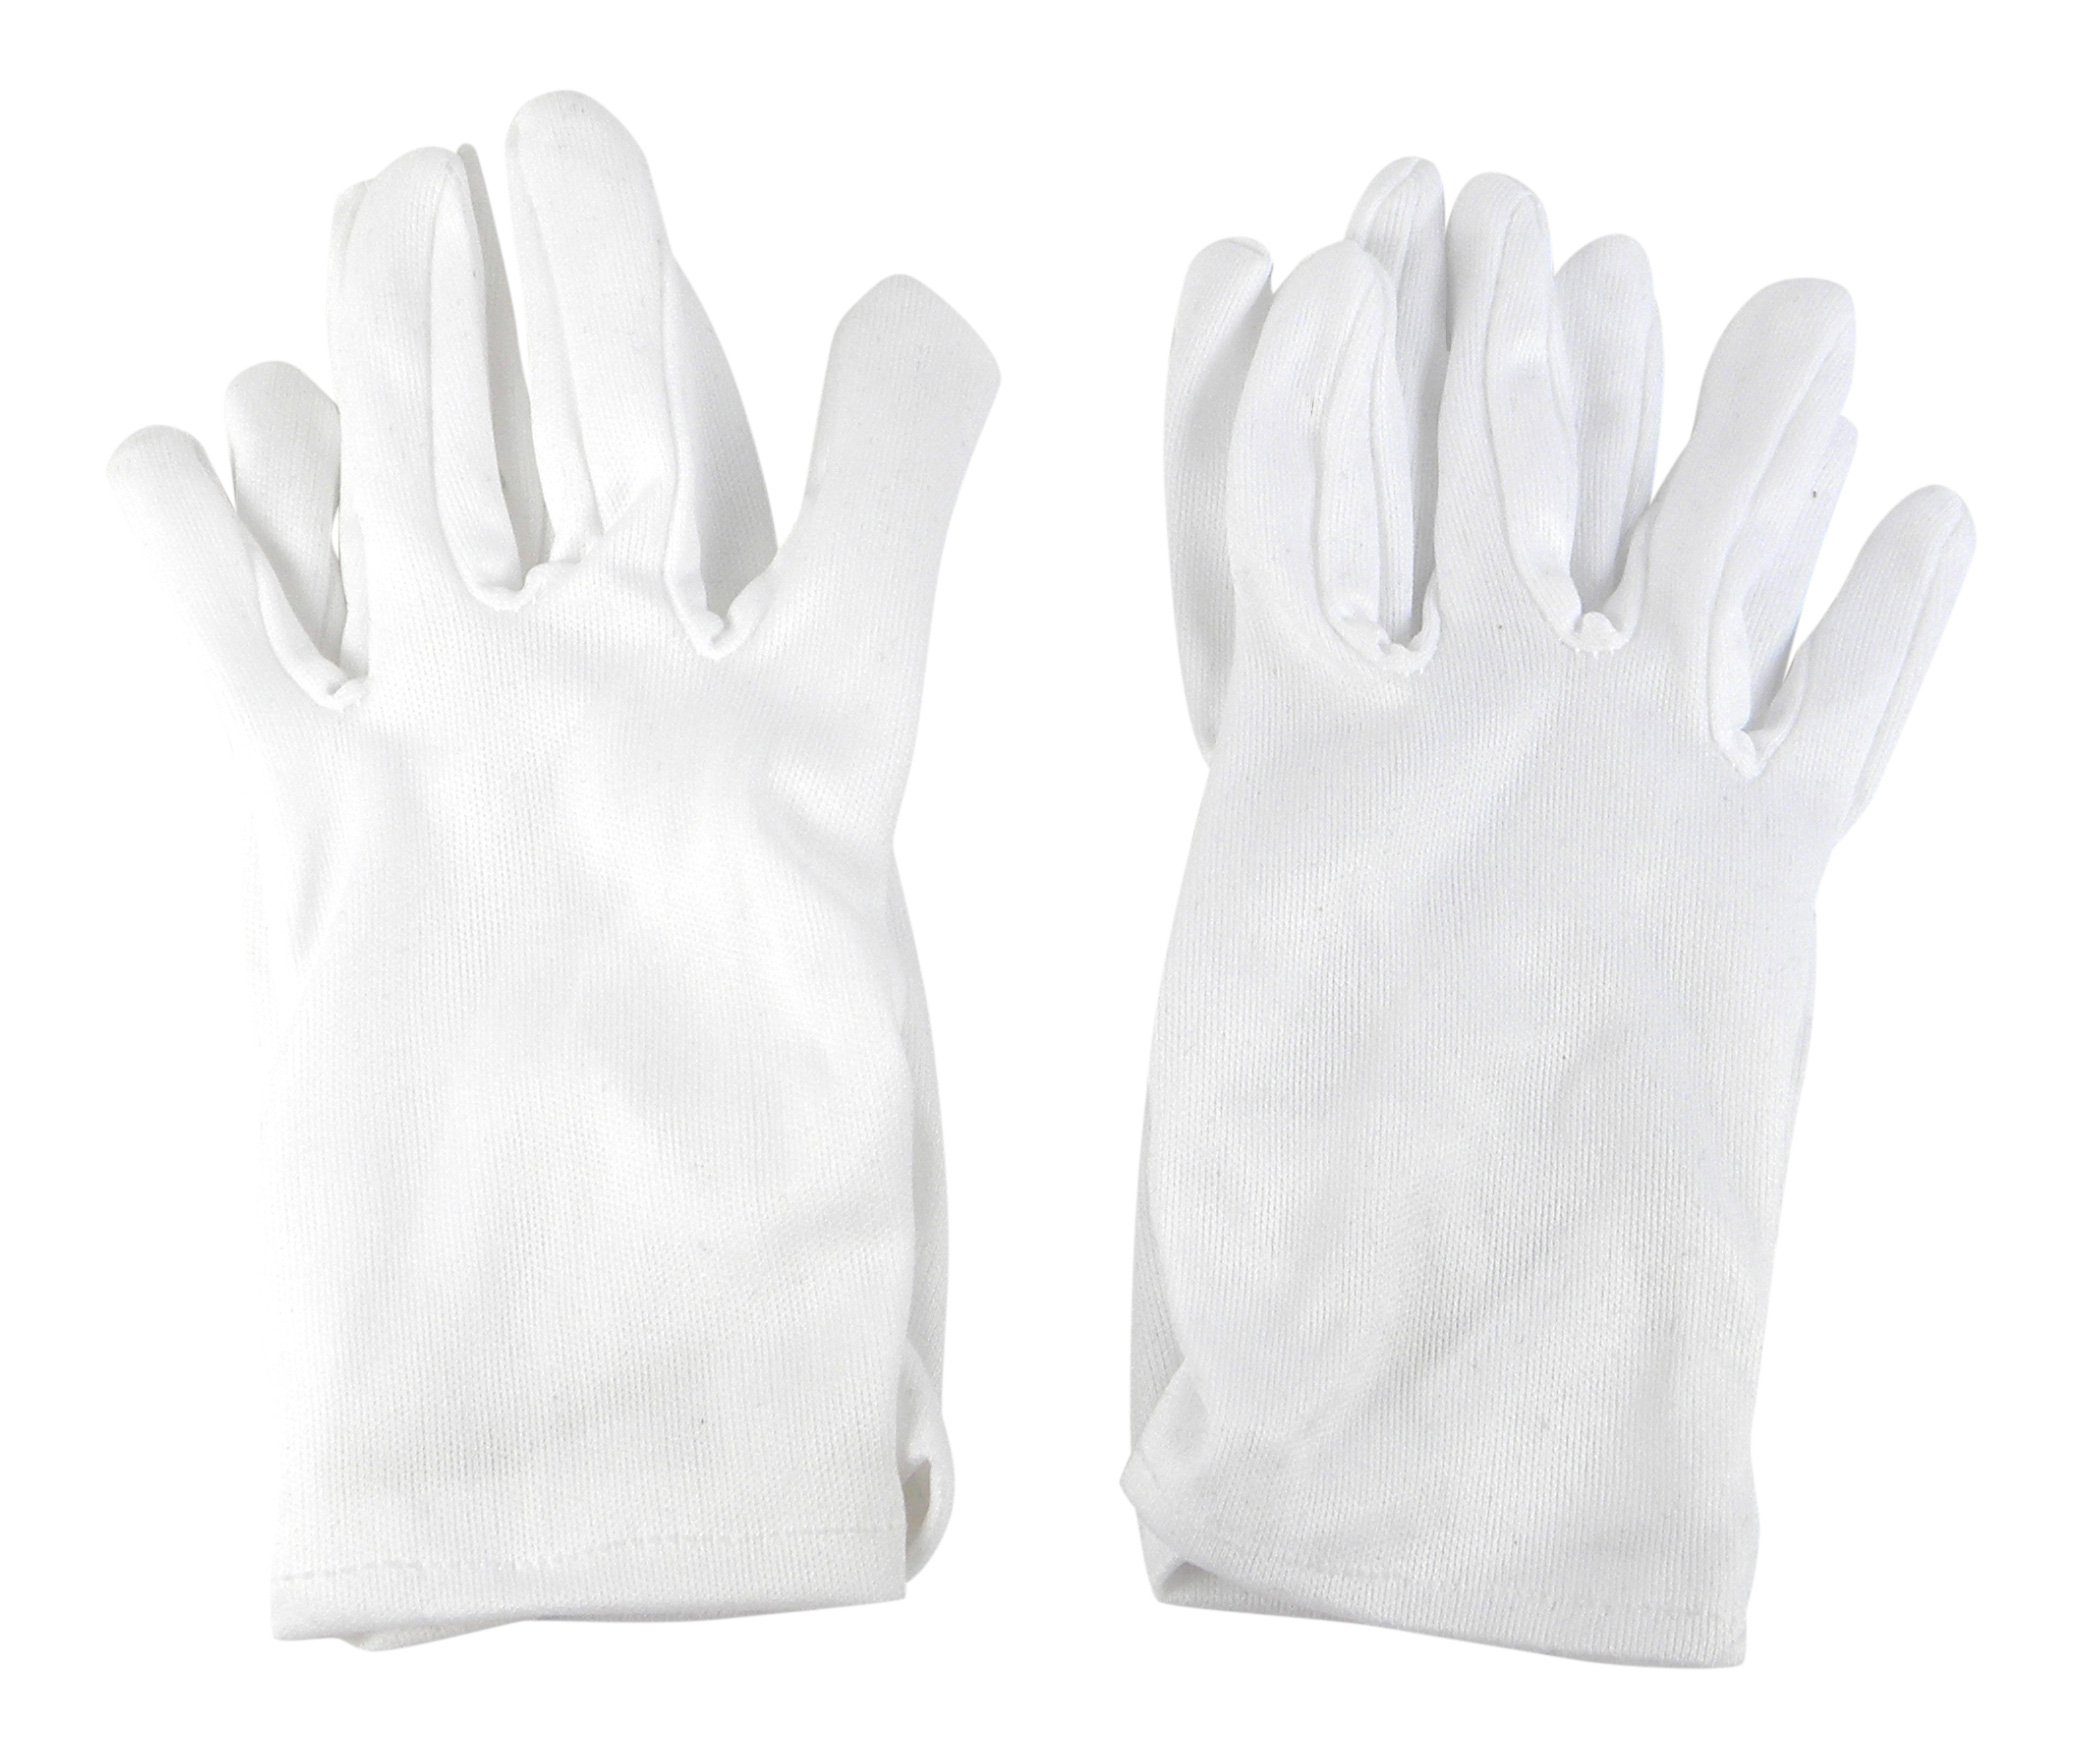 Girls Tea Party Stretch Polyester Dress Short Gloves Set of 4 White Childrens